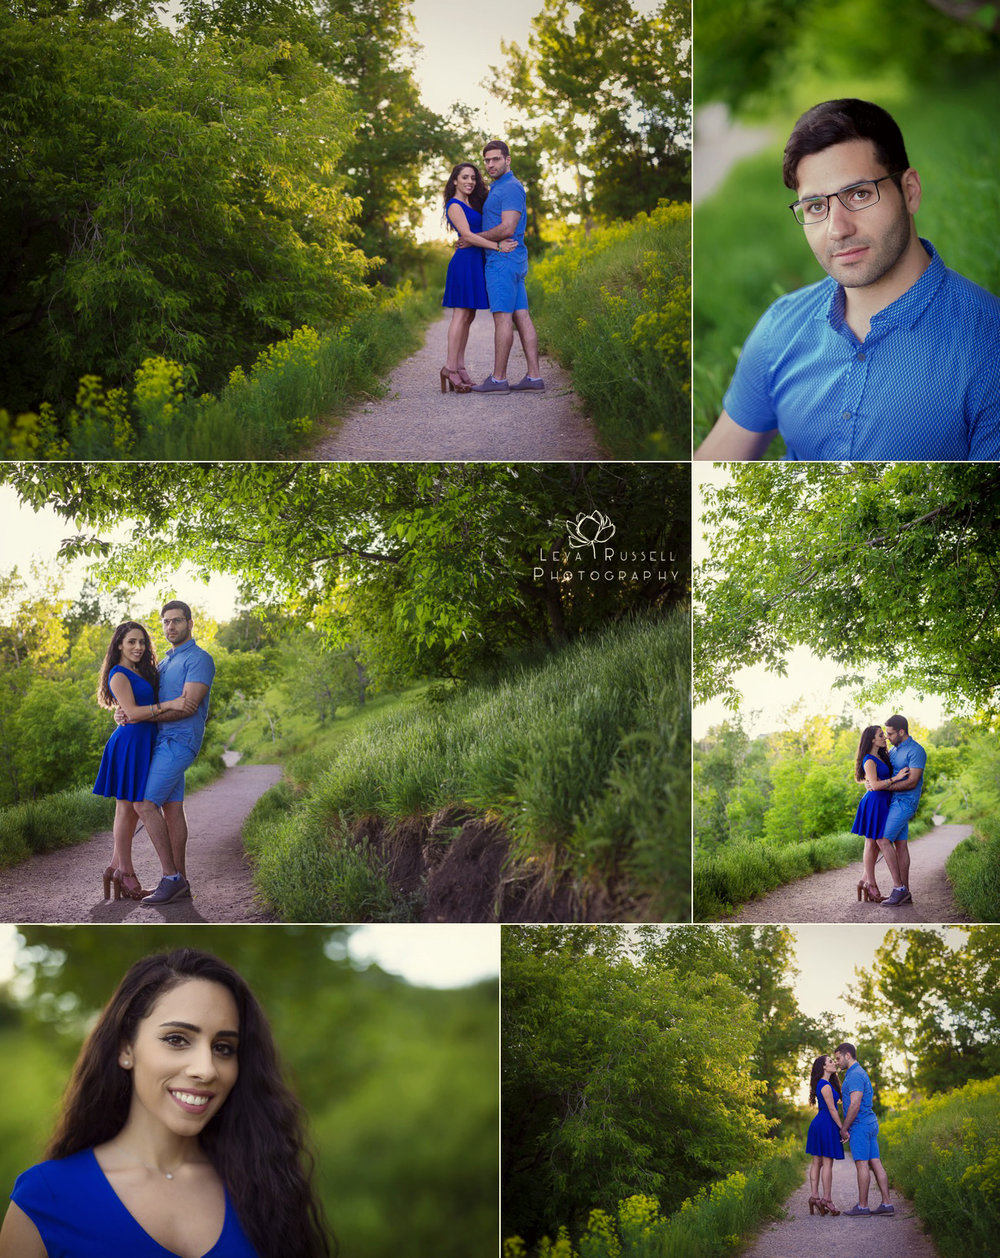 015-Donya & Kal S:P.jpg